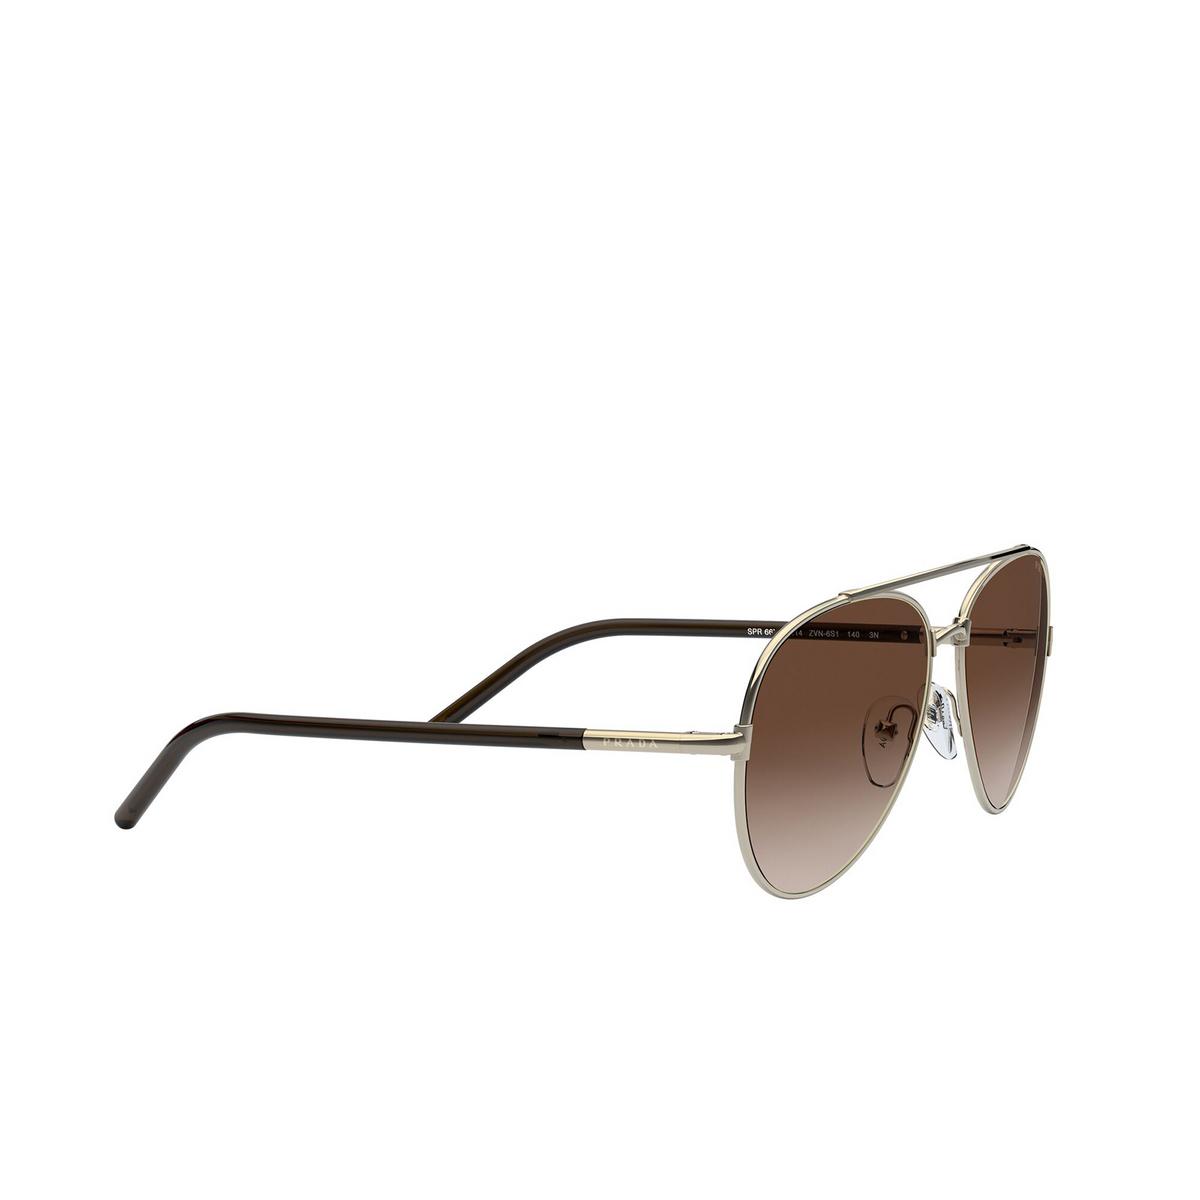 Prada® Aviator Sunglasses: PR 66XS color Pale Gold ZVN6S1 - three-quarters view.